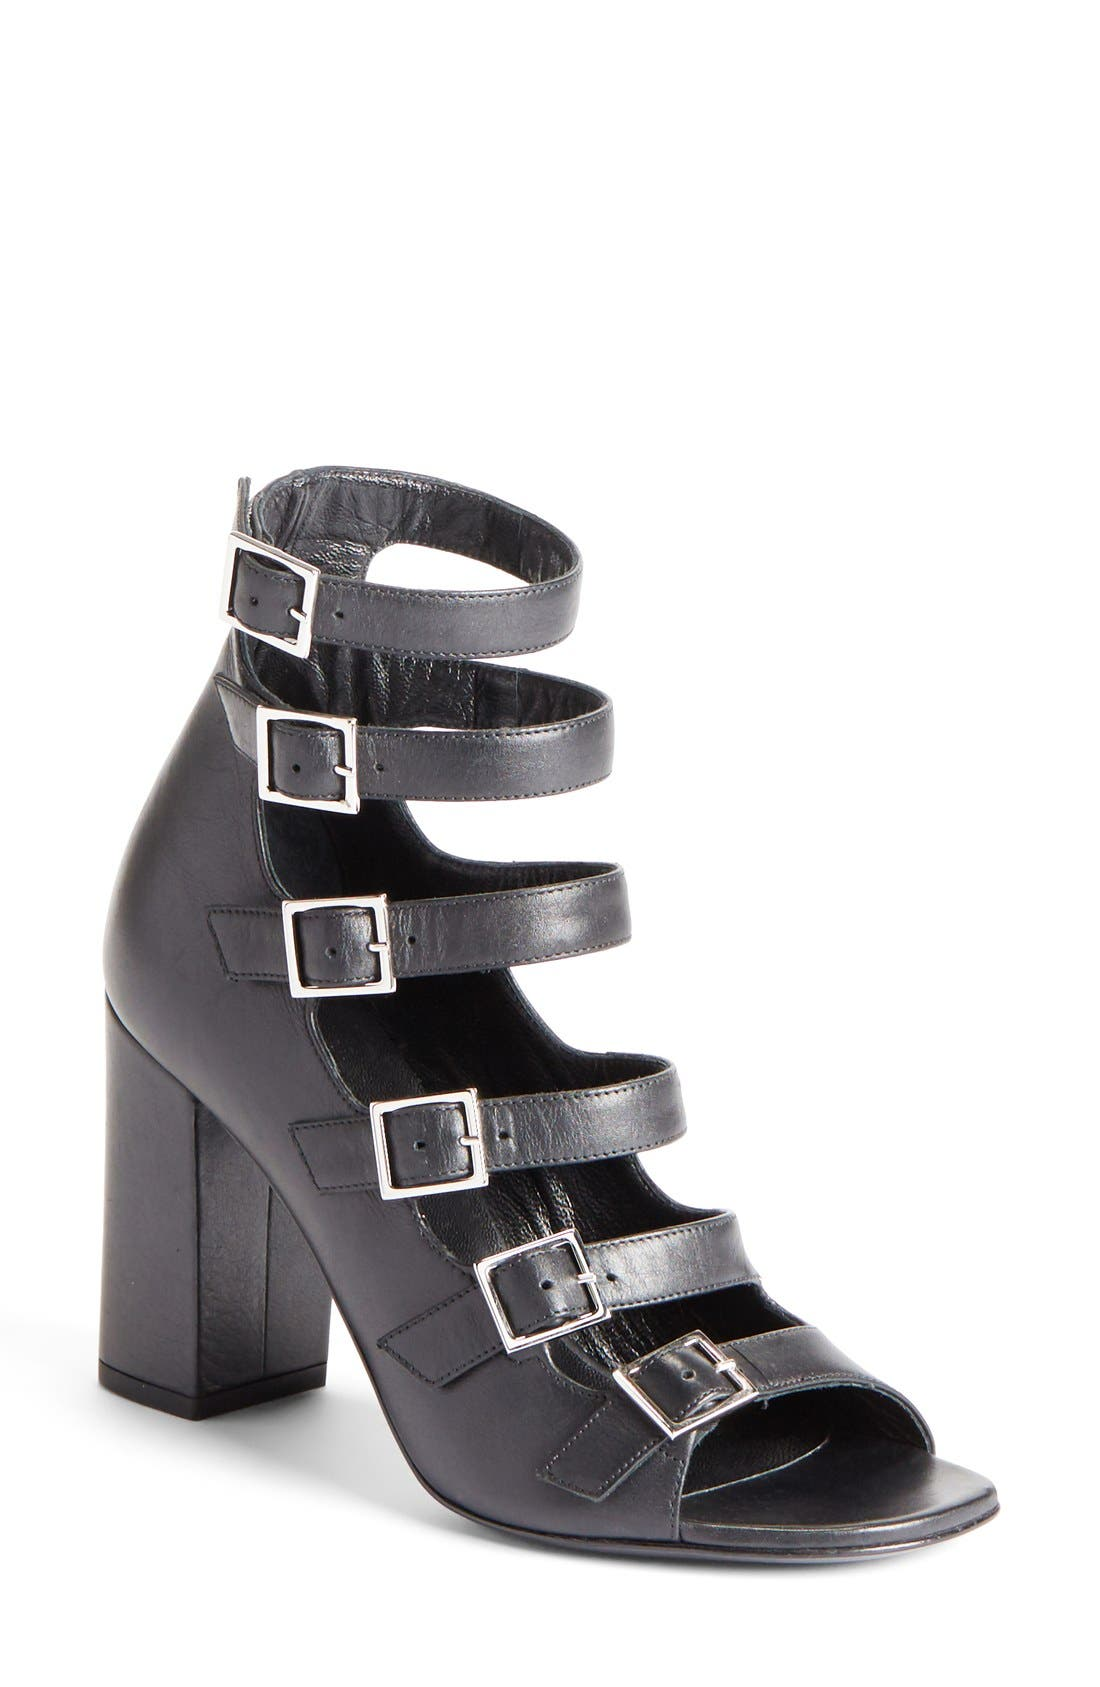 'Babies' Buckle Strap Sandal,                         Main,                         color, Black Leather